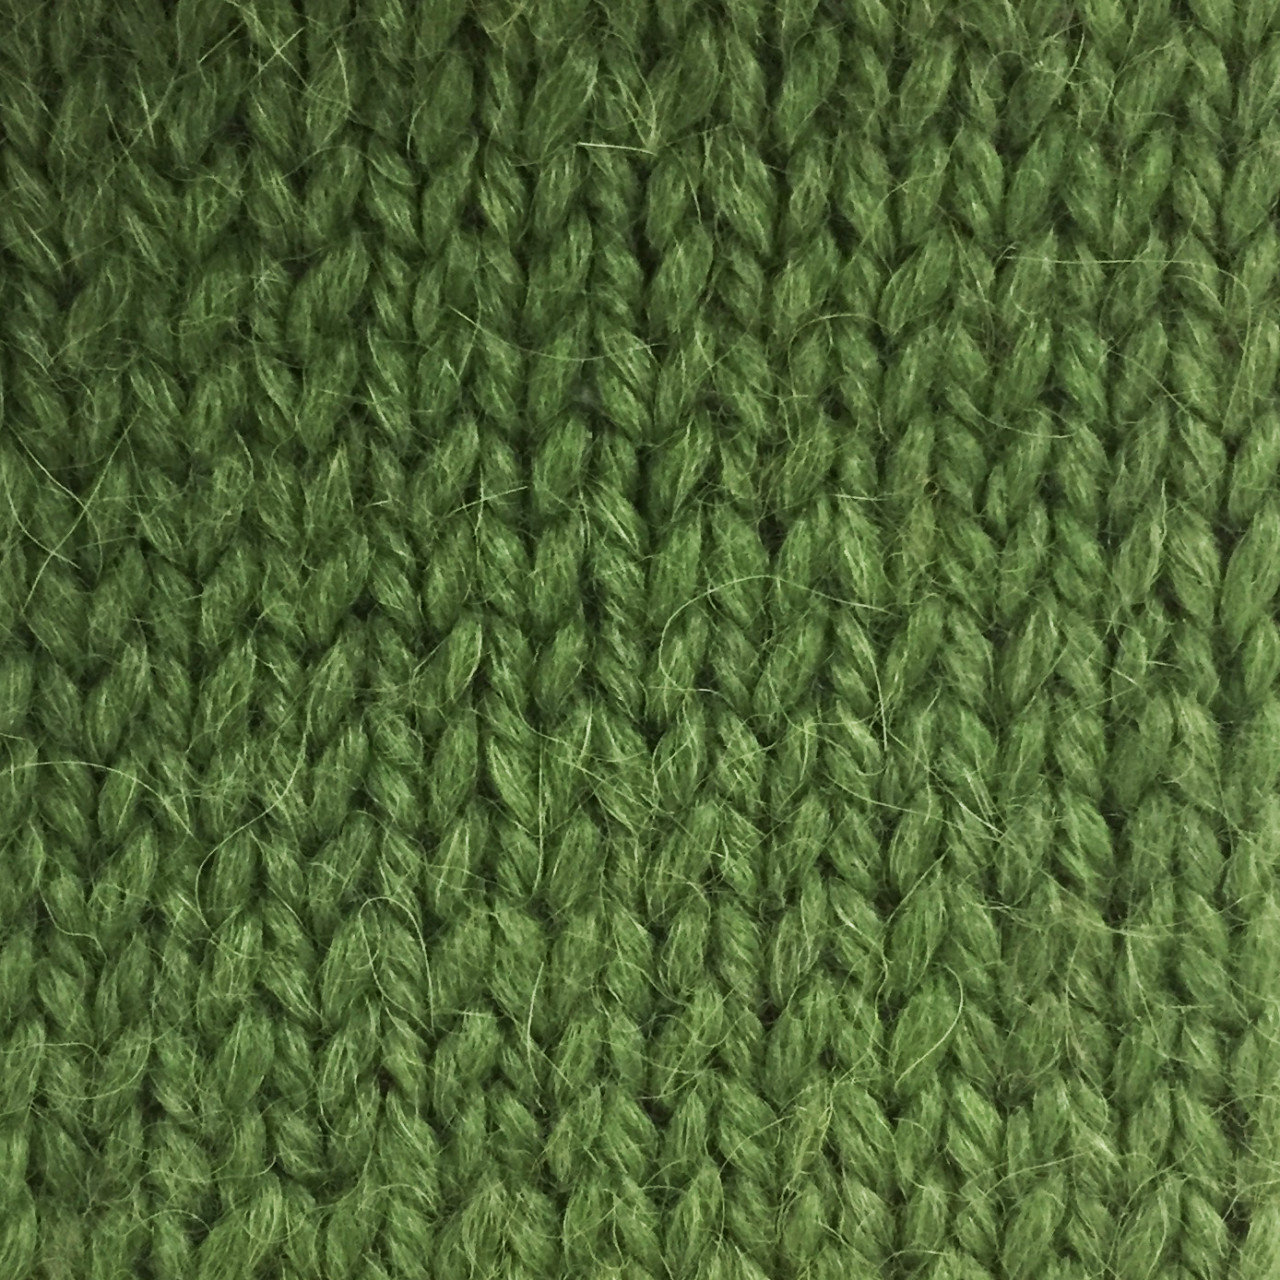 Snuggle Bulky Alpaca Blend Yarn - Shire AYC-6350